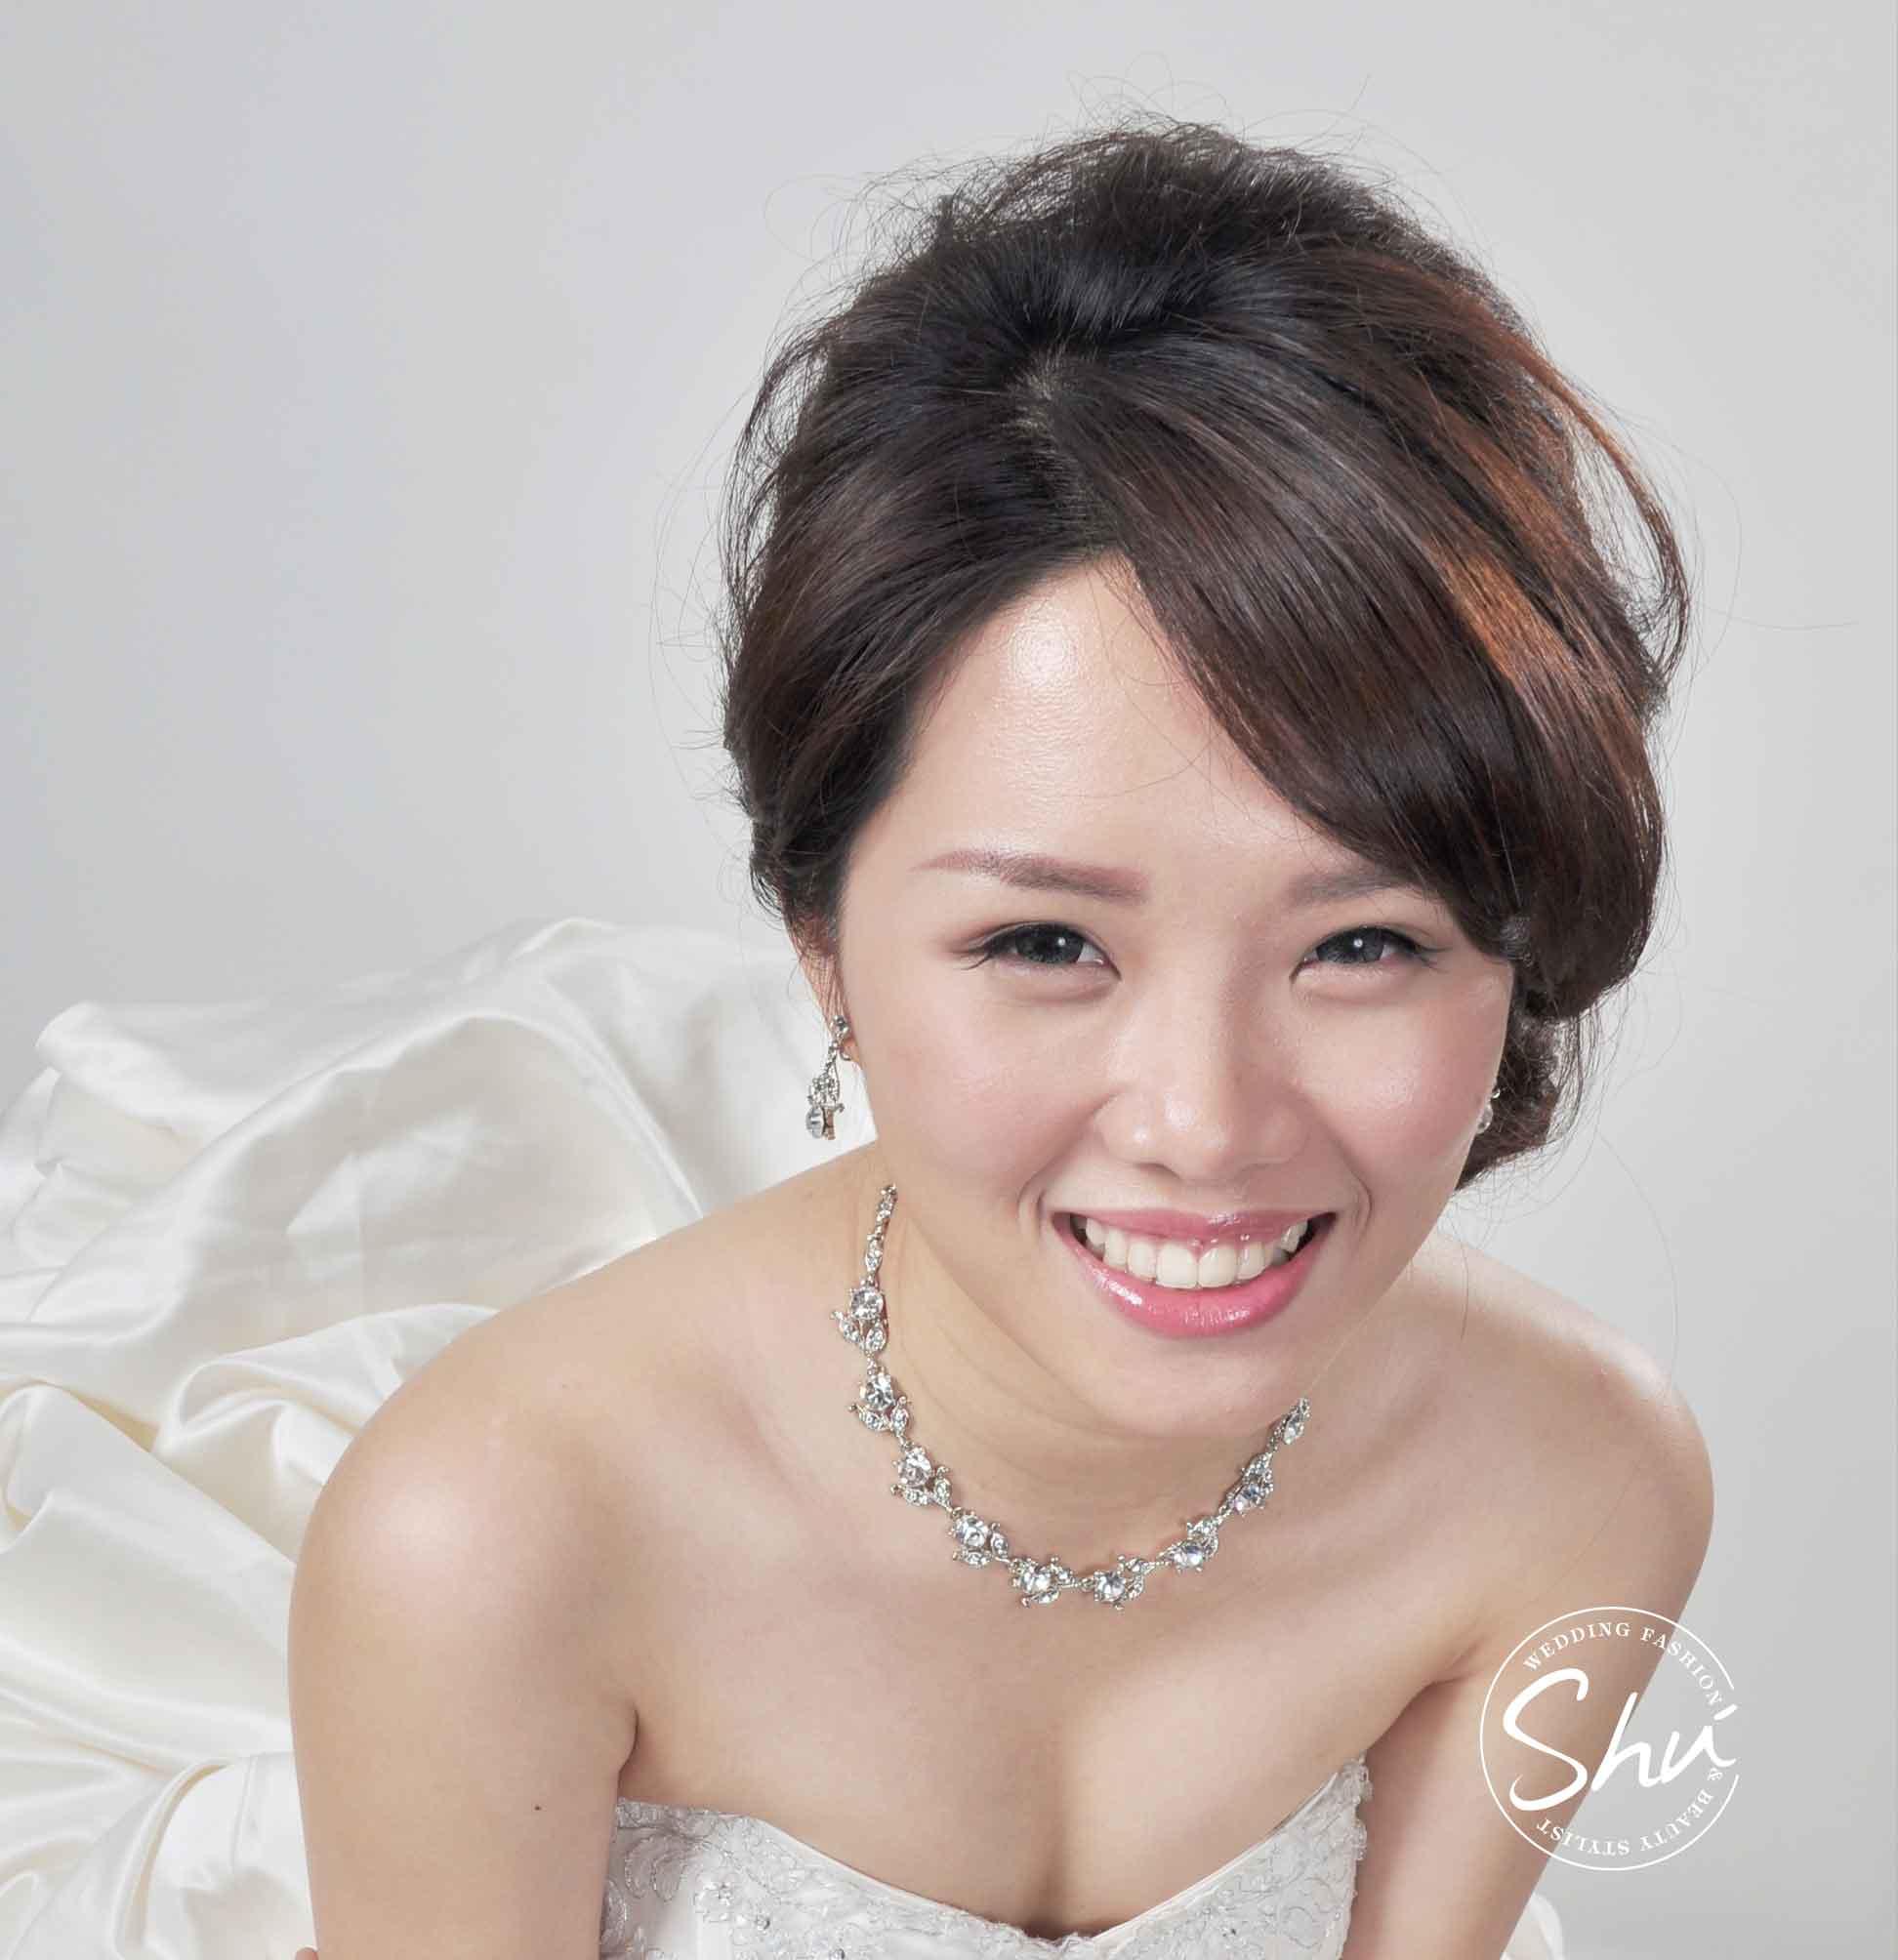 Bride_Make_up_Wedding_hairstylw201406